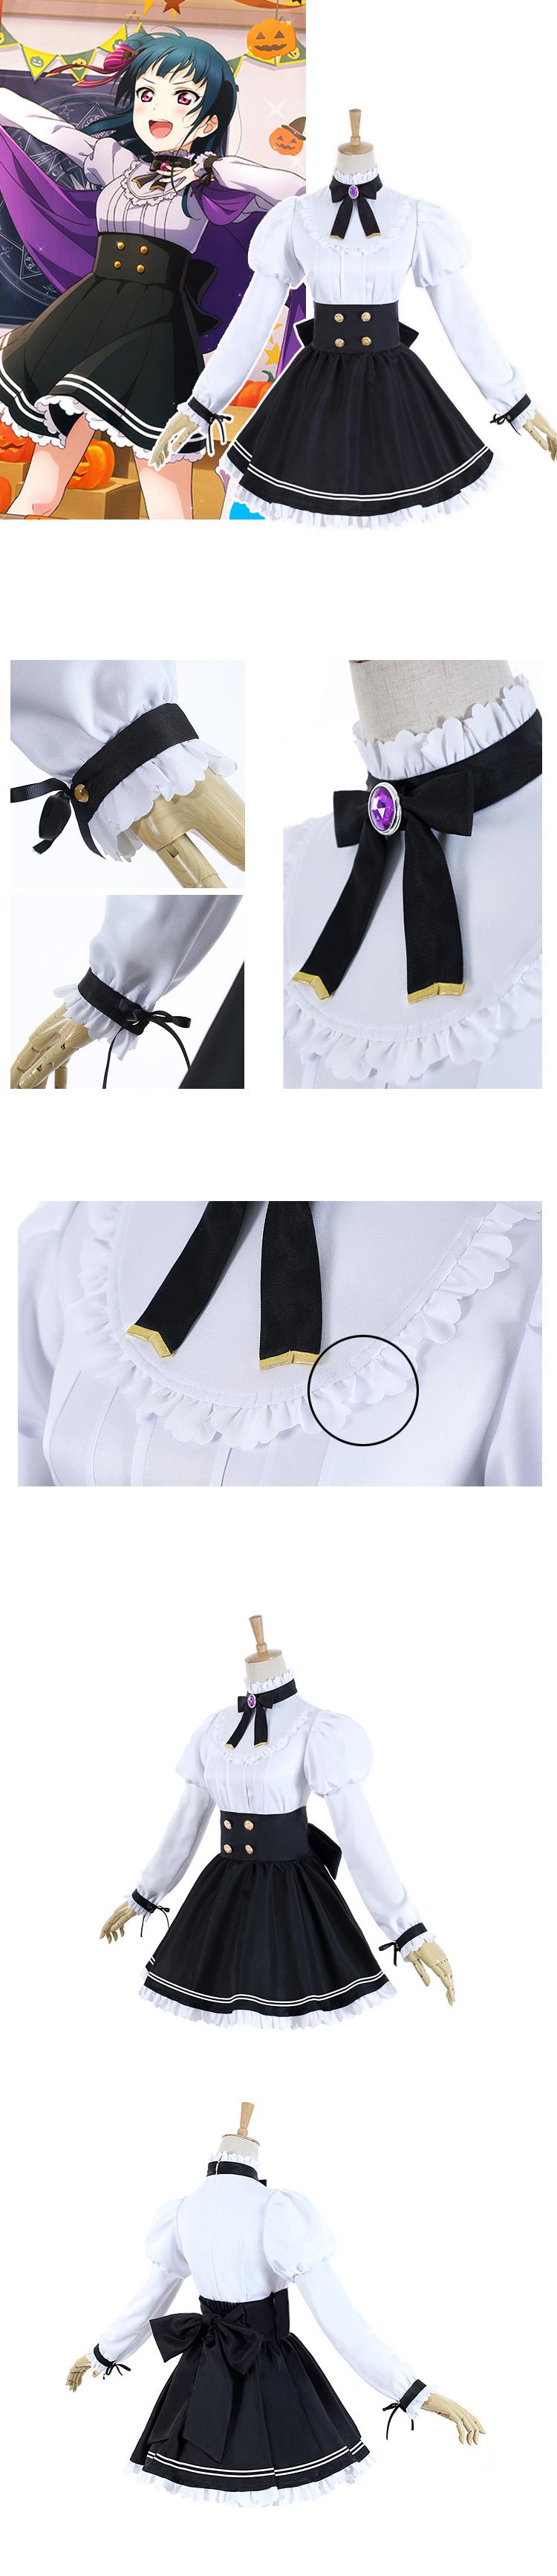 Anime Cosplay Anime Lovelive Sunshine Aqours Tsushima Yoshiko Halloween Unawaken cosplay costume lolita dress school uniform (6)